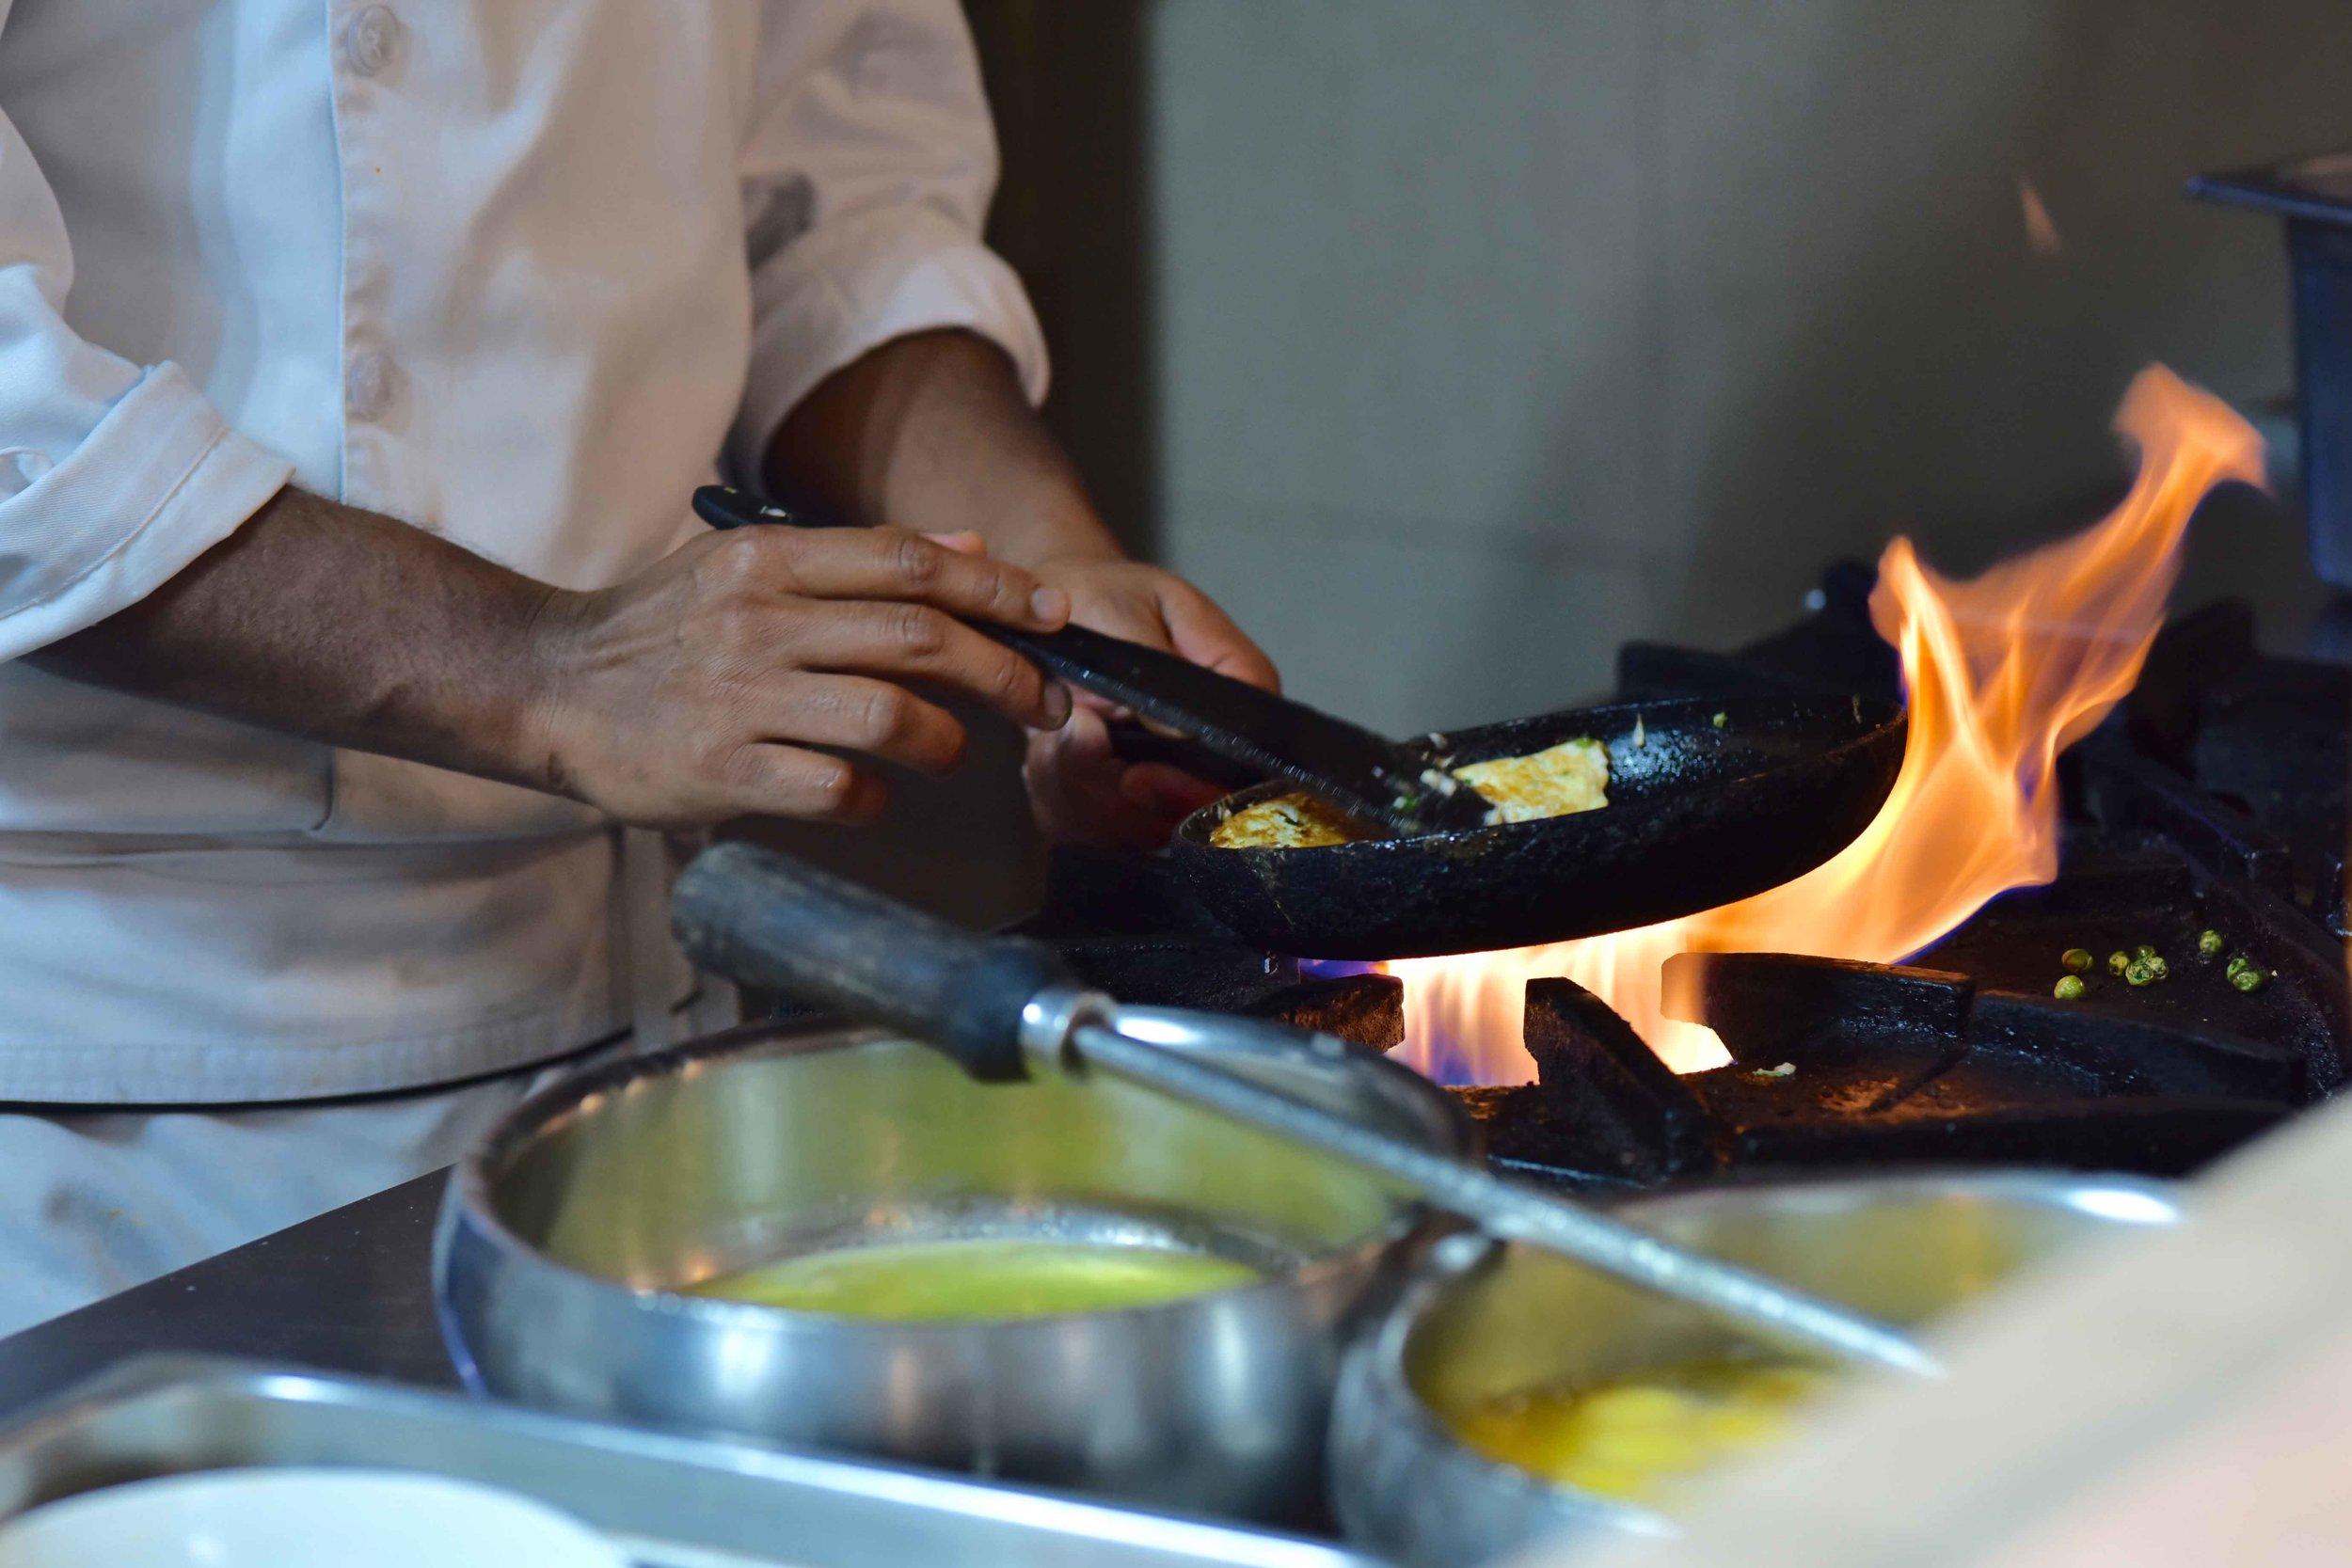 Radisson Blu Hotel, breakfast buffet, Ranchi, Jharkhand, India. Image©sourcingstyle.com.